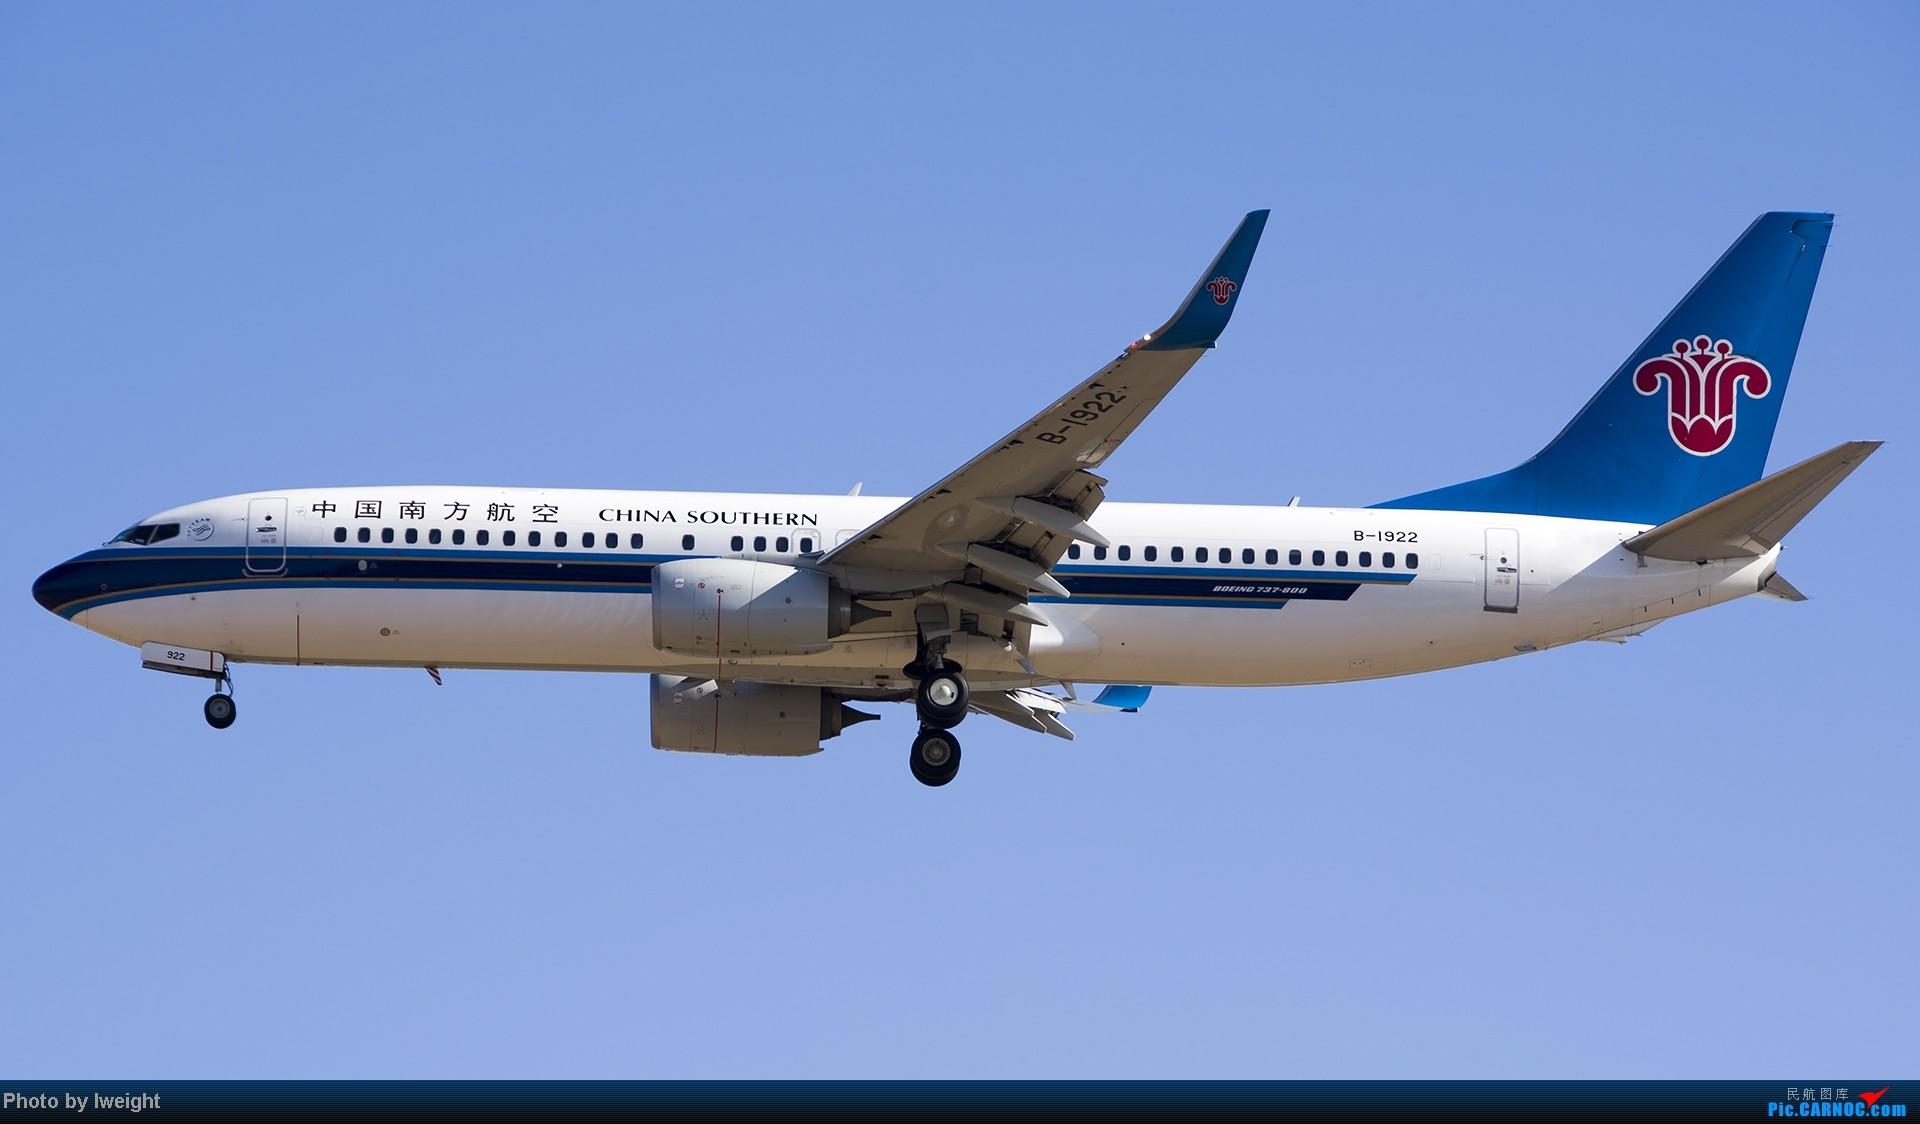 Re:[原创]抓住APEC蓝的尾巴,再拍上一组 BOEING 737-800 B-1922 中国北京首都机场